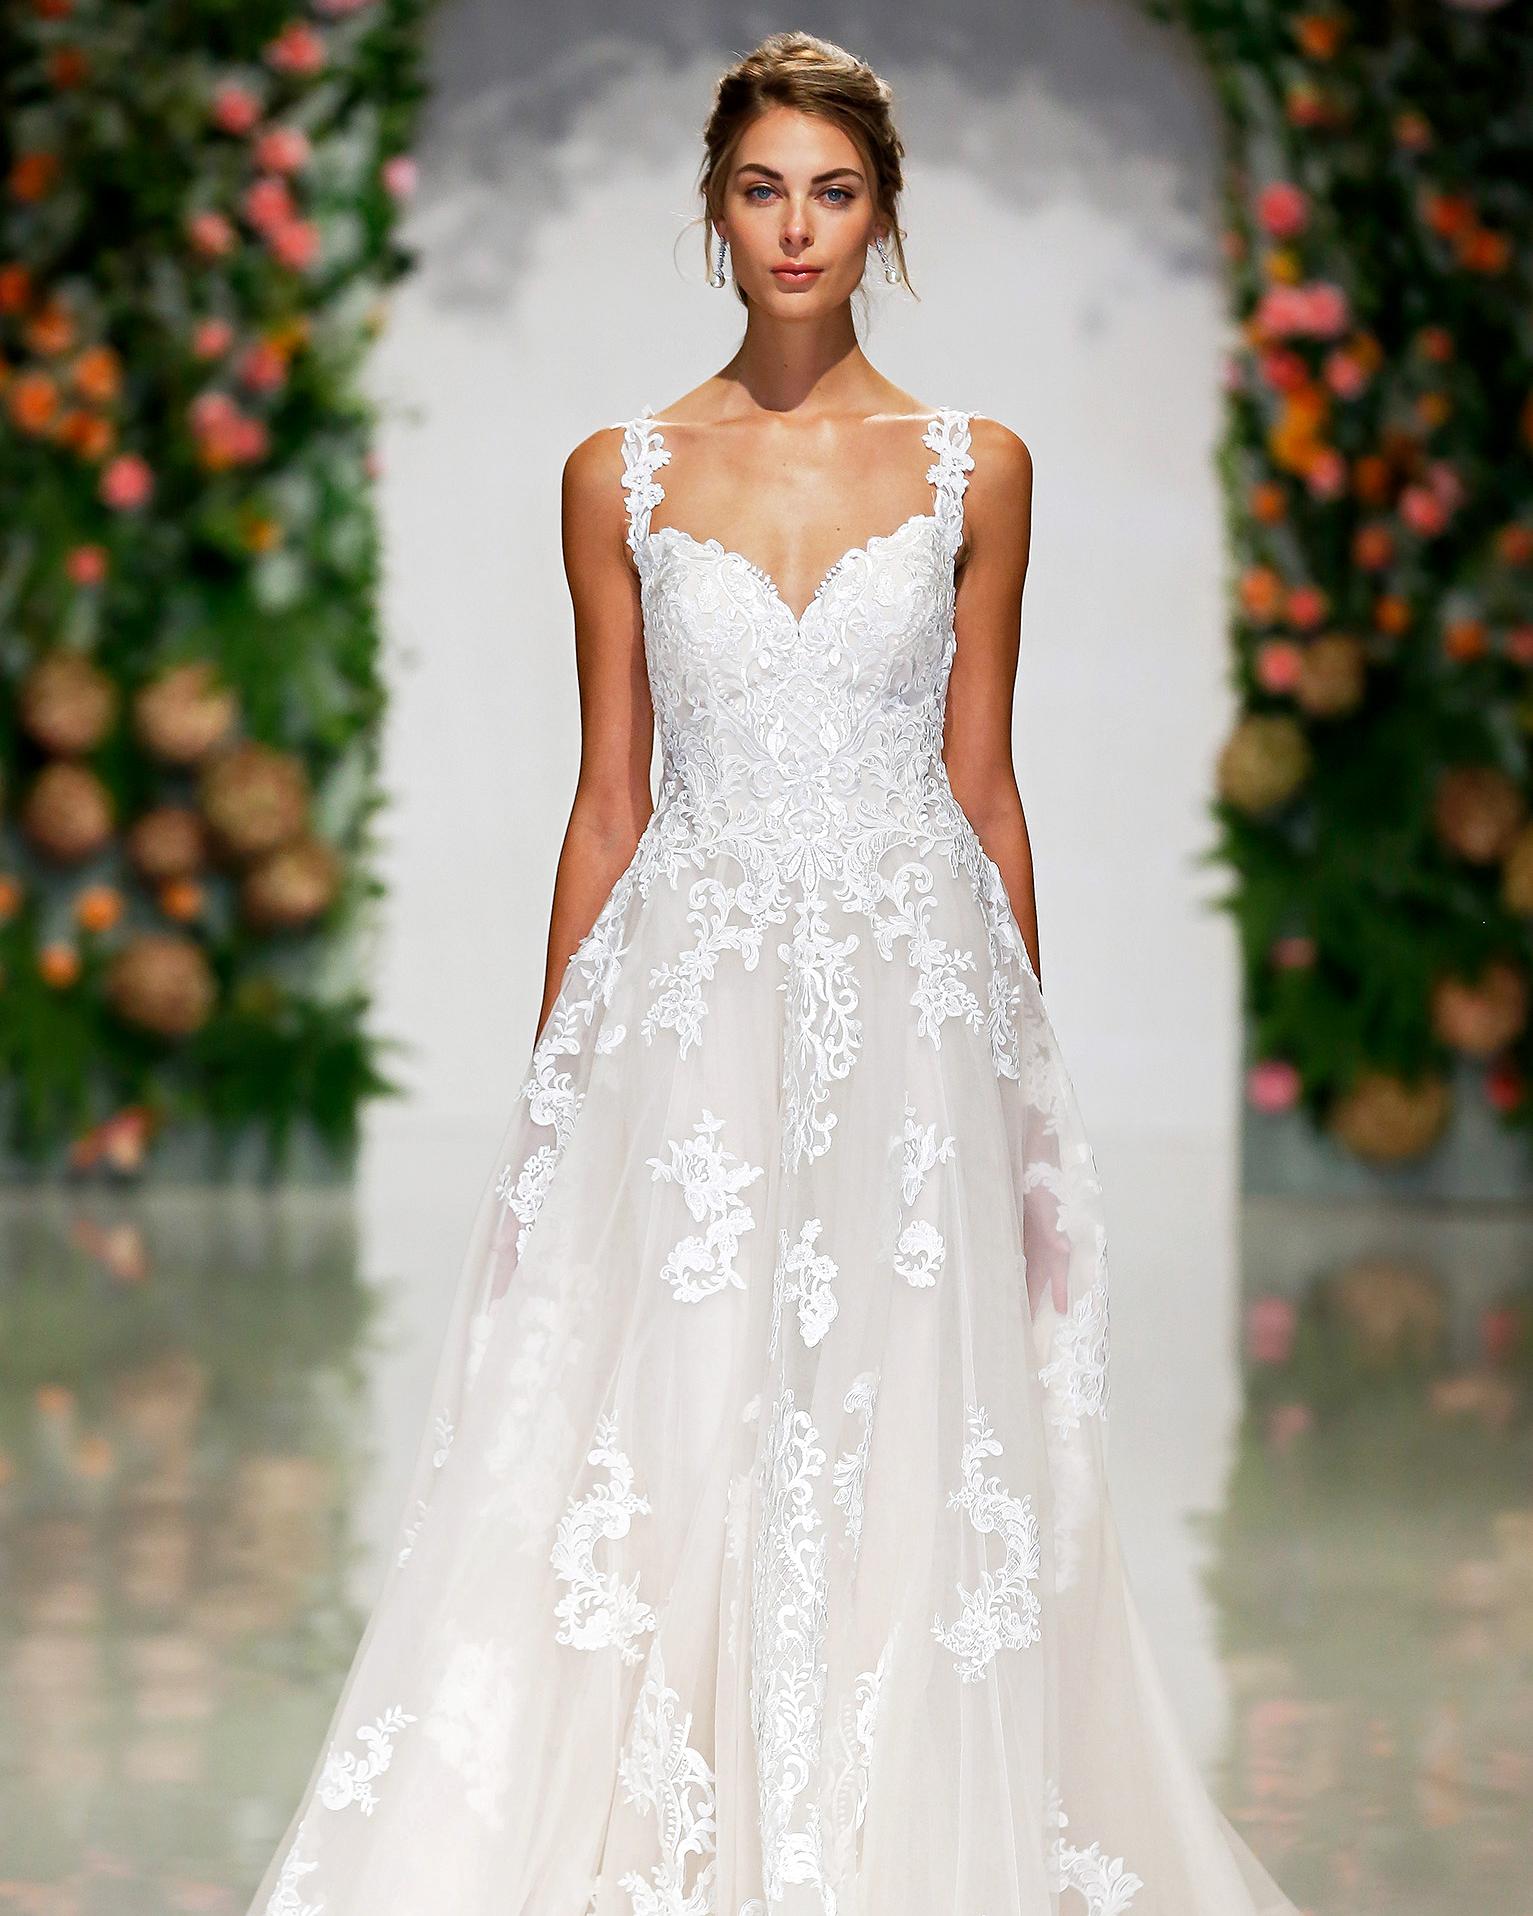 morilee madeline gardner wedding dress sweetheart embroidered a-line